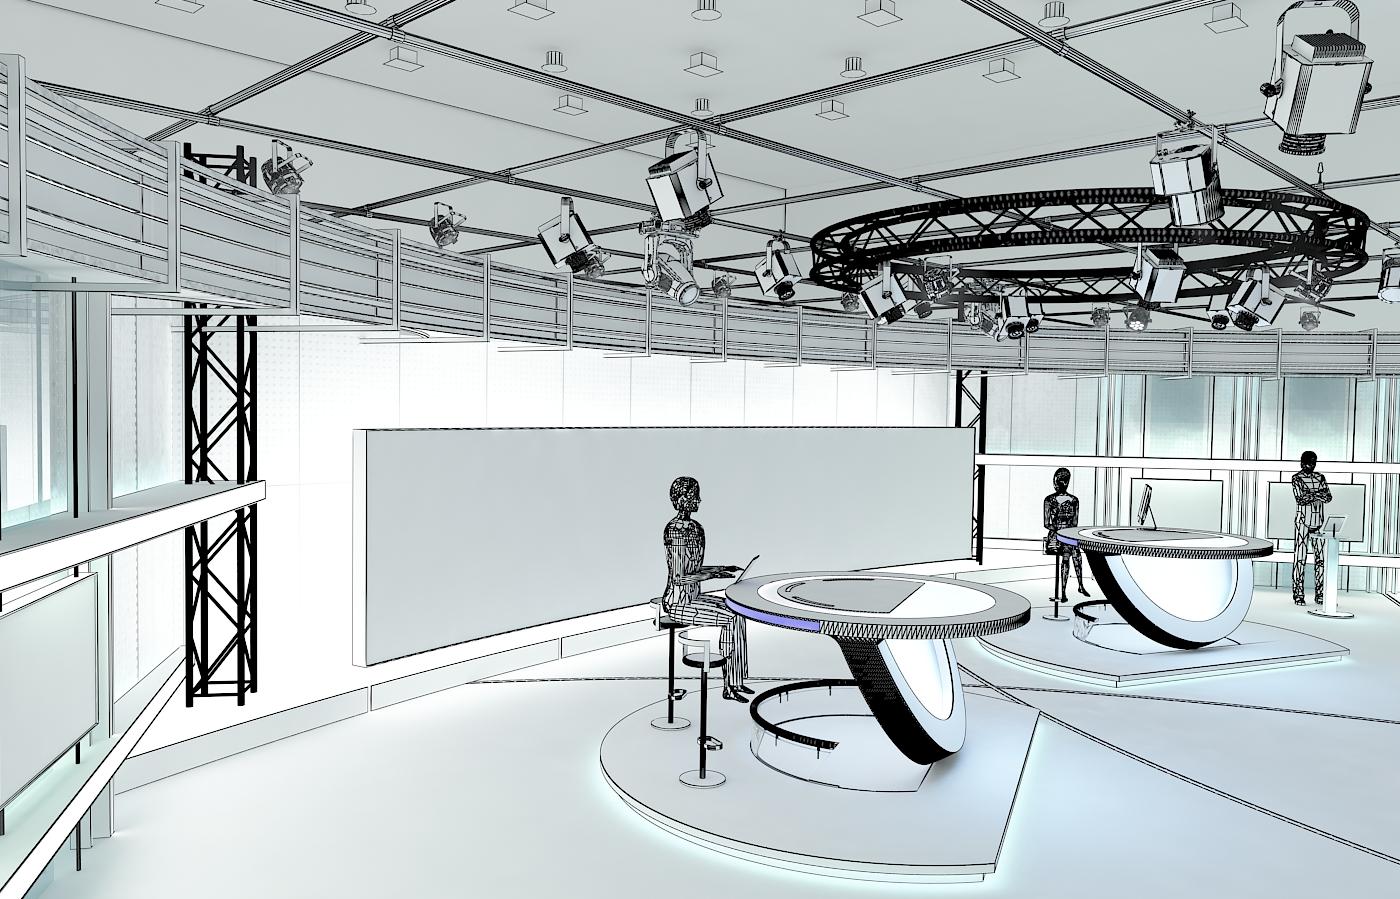 виртуал телевизийн студи цуглуулга vol 6 3d загвар max dxf dwg fbx obj 223402